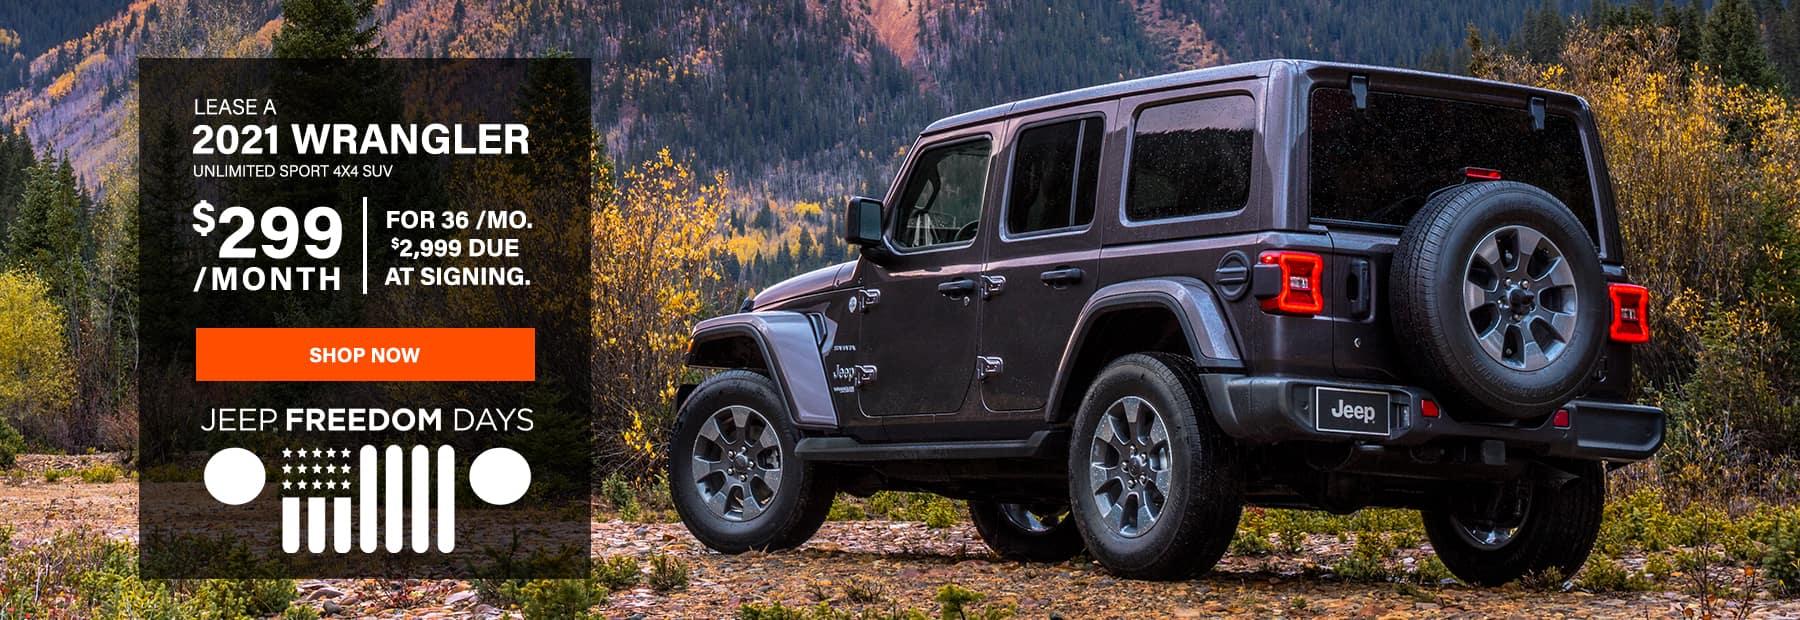 2021-05-04 Jeep Wrangler Desktop